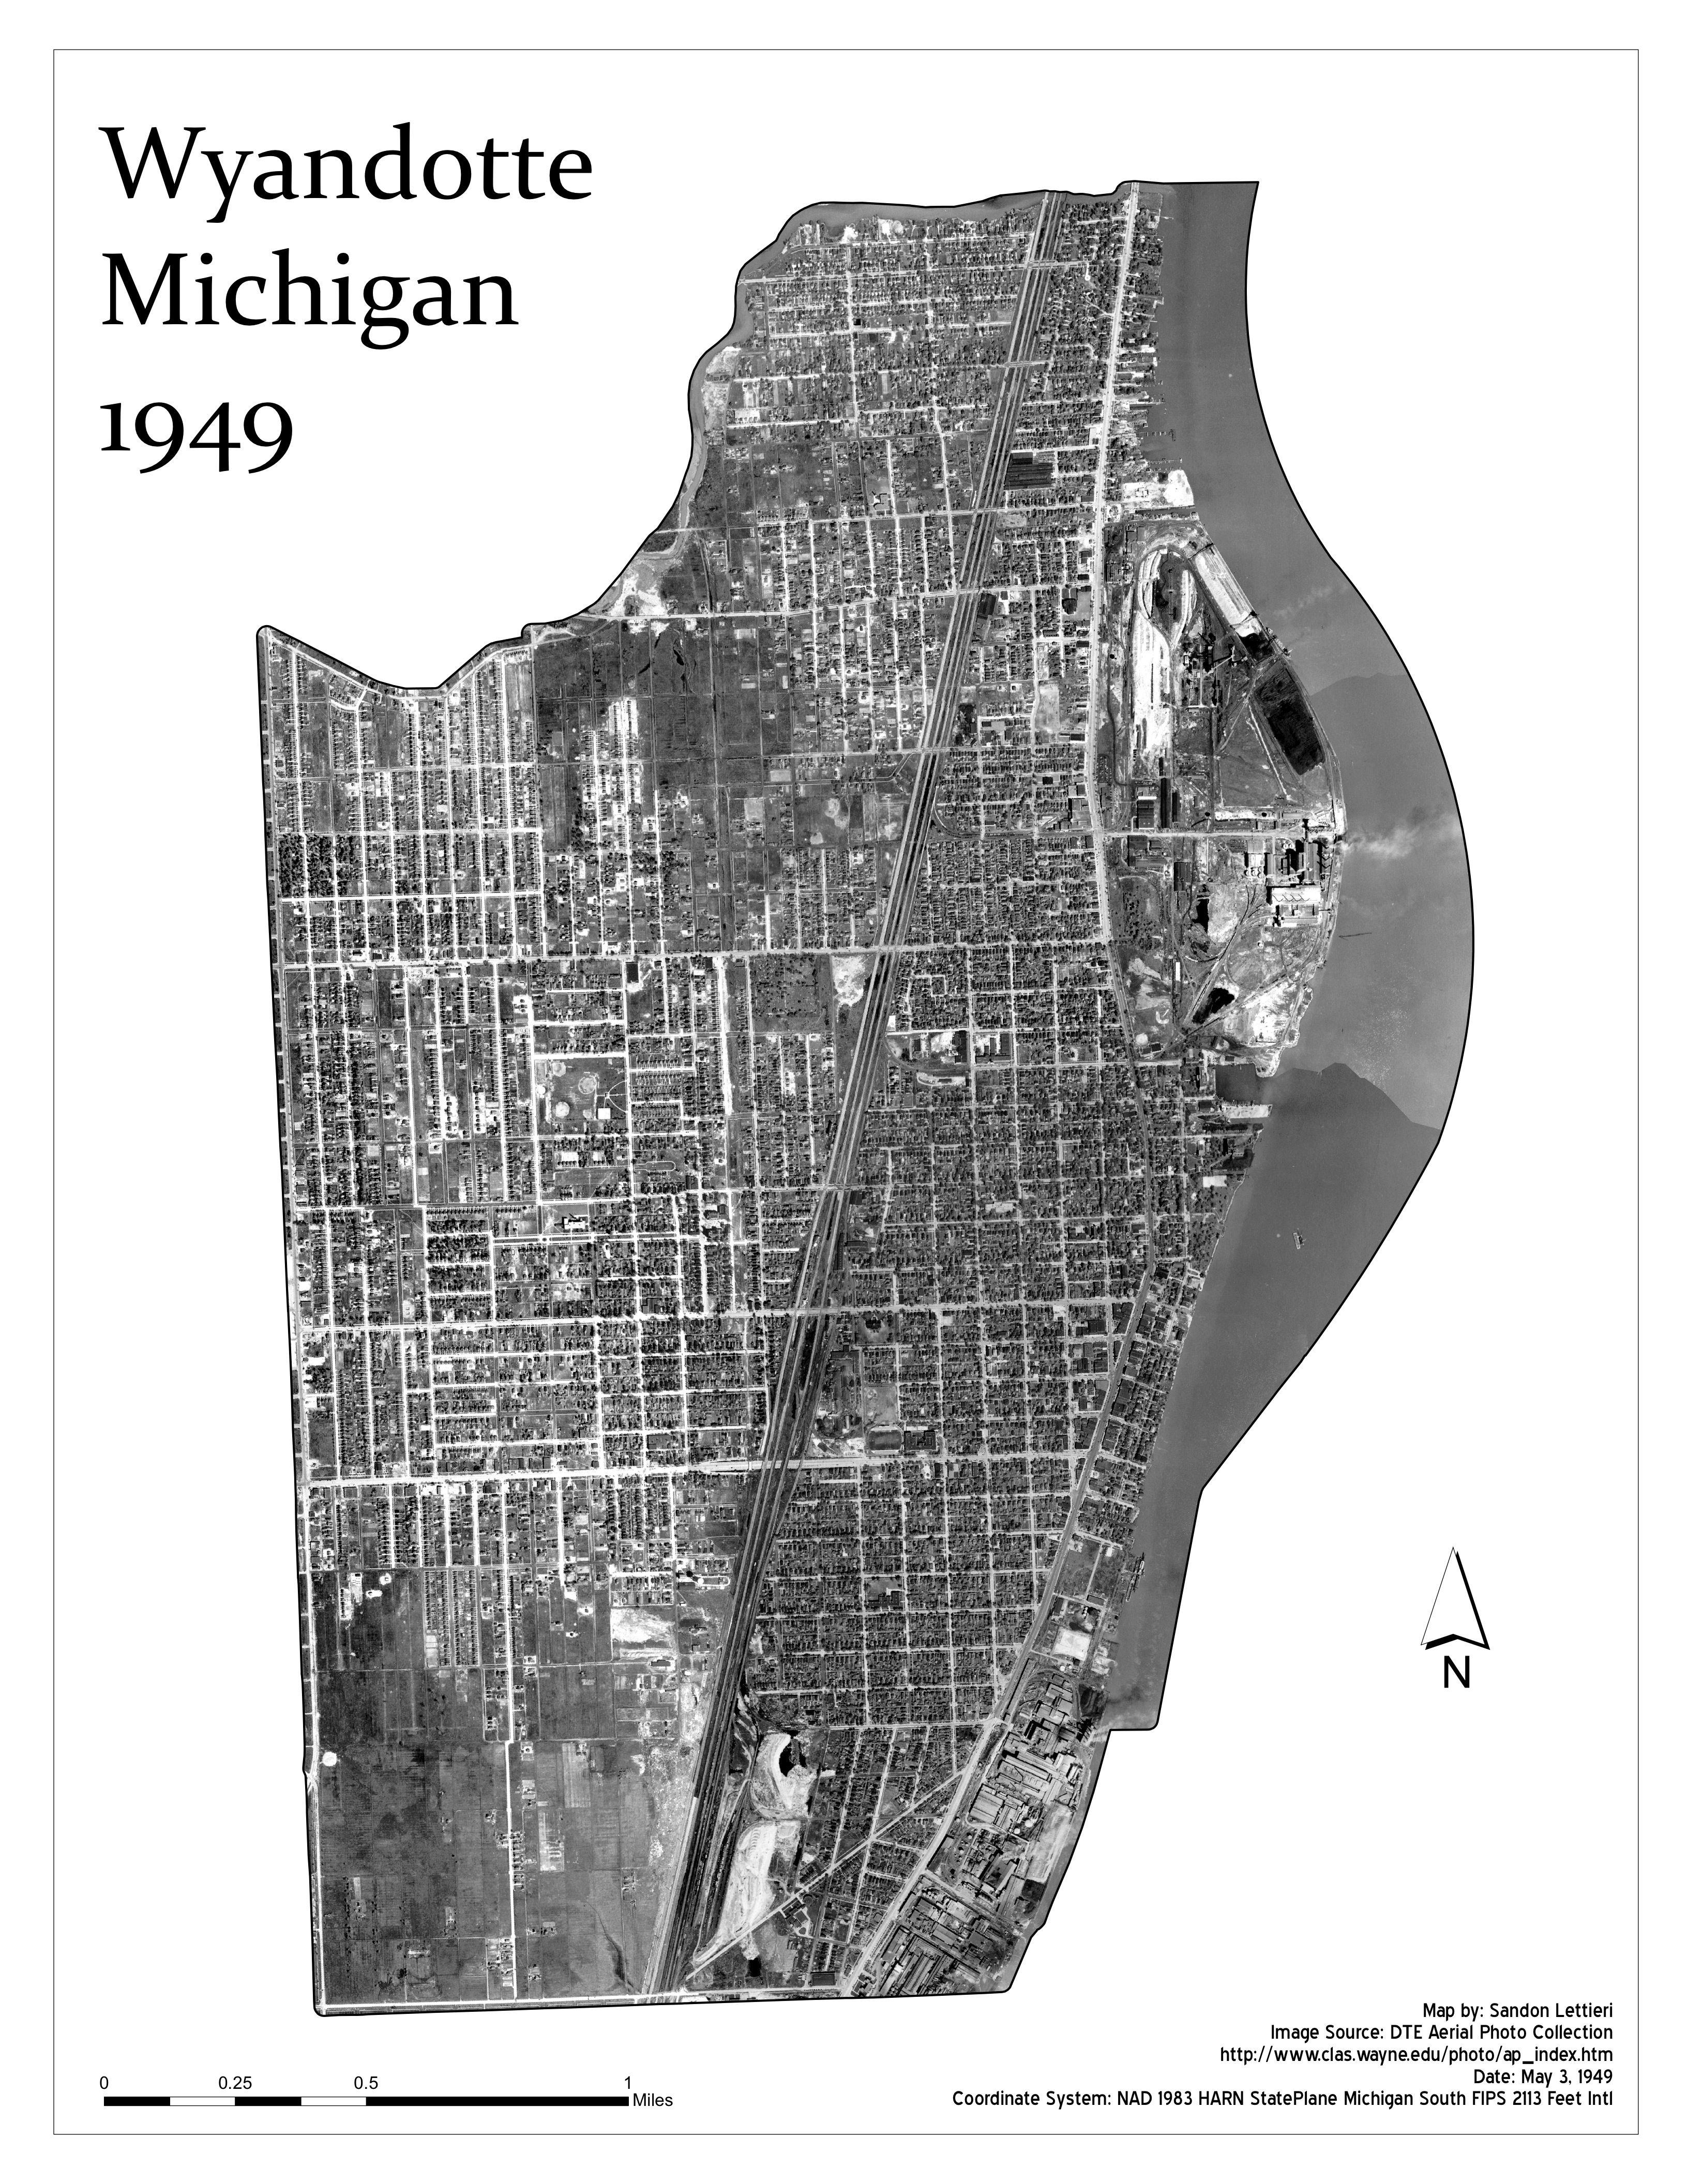 Kresge Auditorium Map Of Traverse City Mi on map of brethren mi, map of north oakland county mi, map of leelanau peninsula mi, map of grayling mi, map of ubly mi, map of covert mi, map of vermontville mi, map of bangor mi, map of pleasant ridge mi, map of alcona county mi, map of port sanilac mi, map of pelkie mi, map of torch lake mi, map of st. johns mi, map of saint clair shores mi, map of shepherd mi, map of reading mi, map of northern michigan, map of tawas city streets, map of montrose mi,